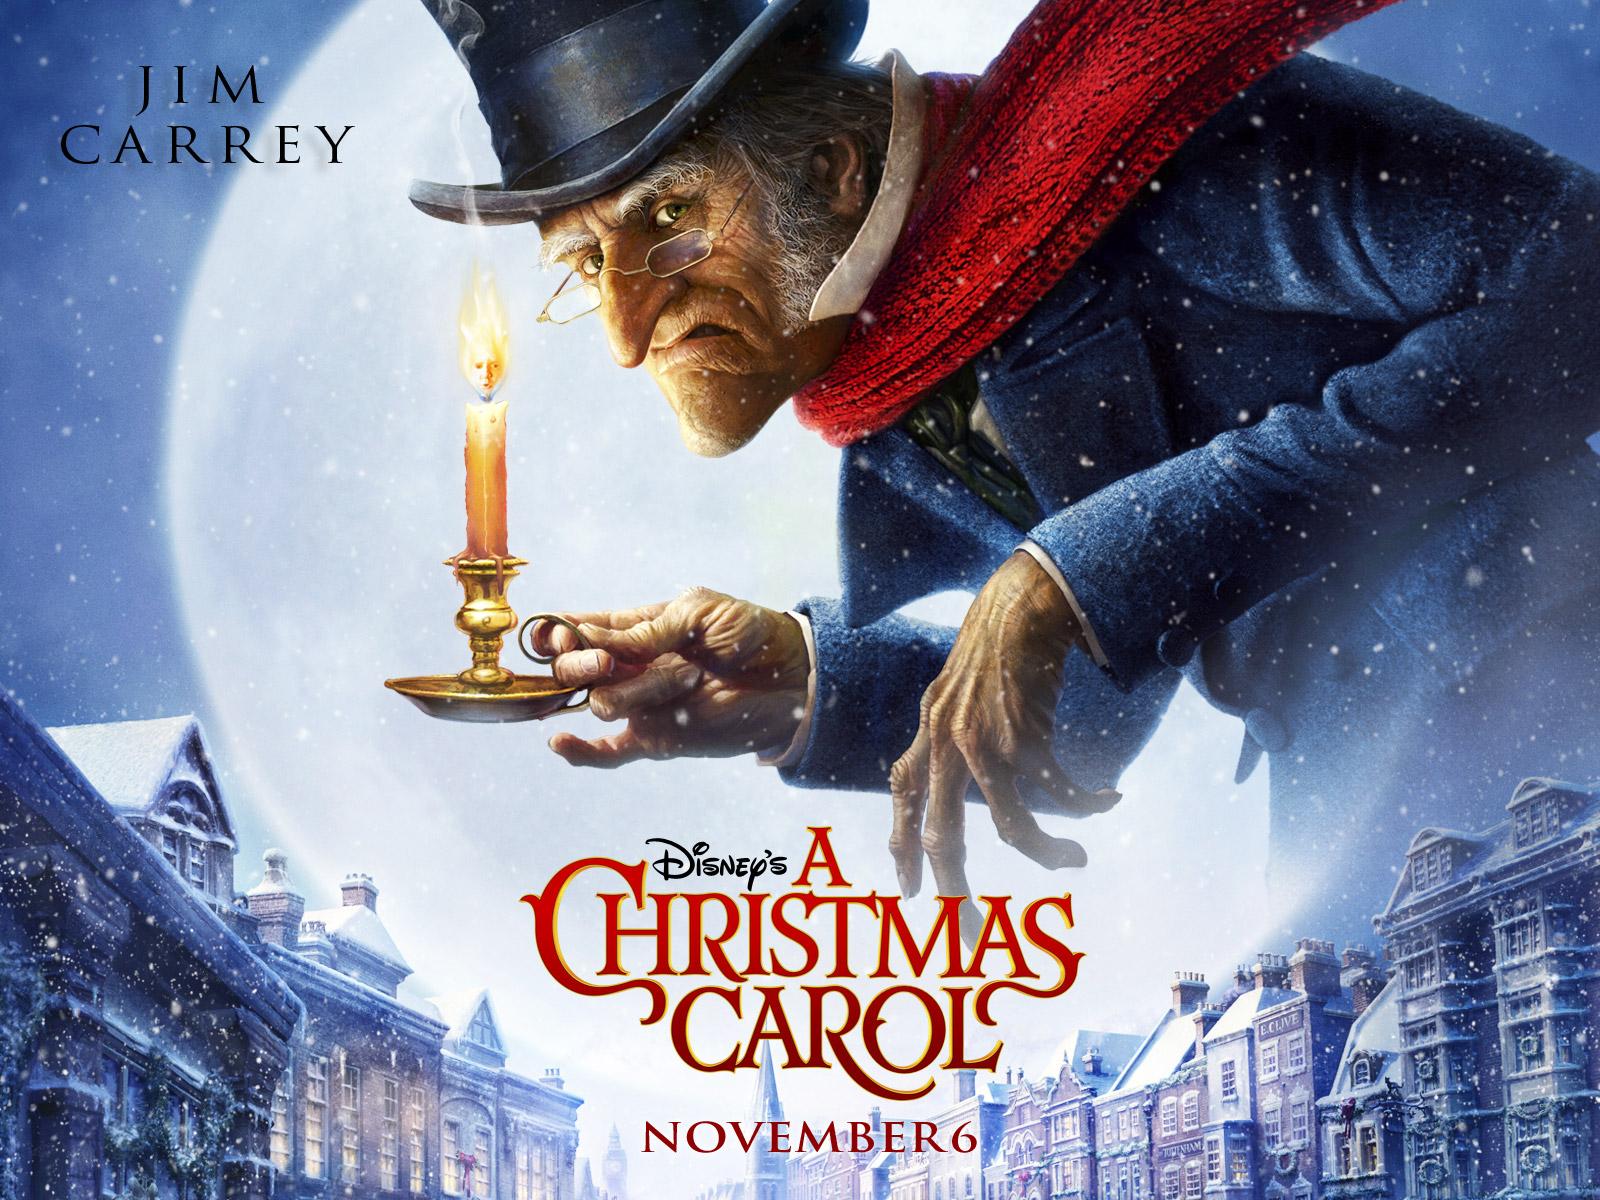 Disney's A Christmas Carol (2009) | DLRP Fan Blog | Disneyland Parijs